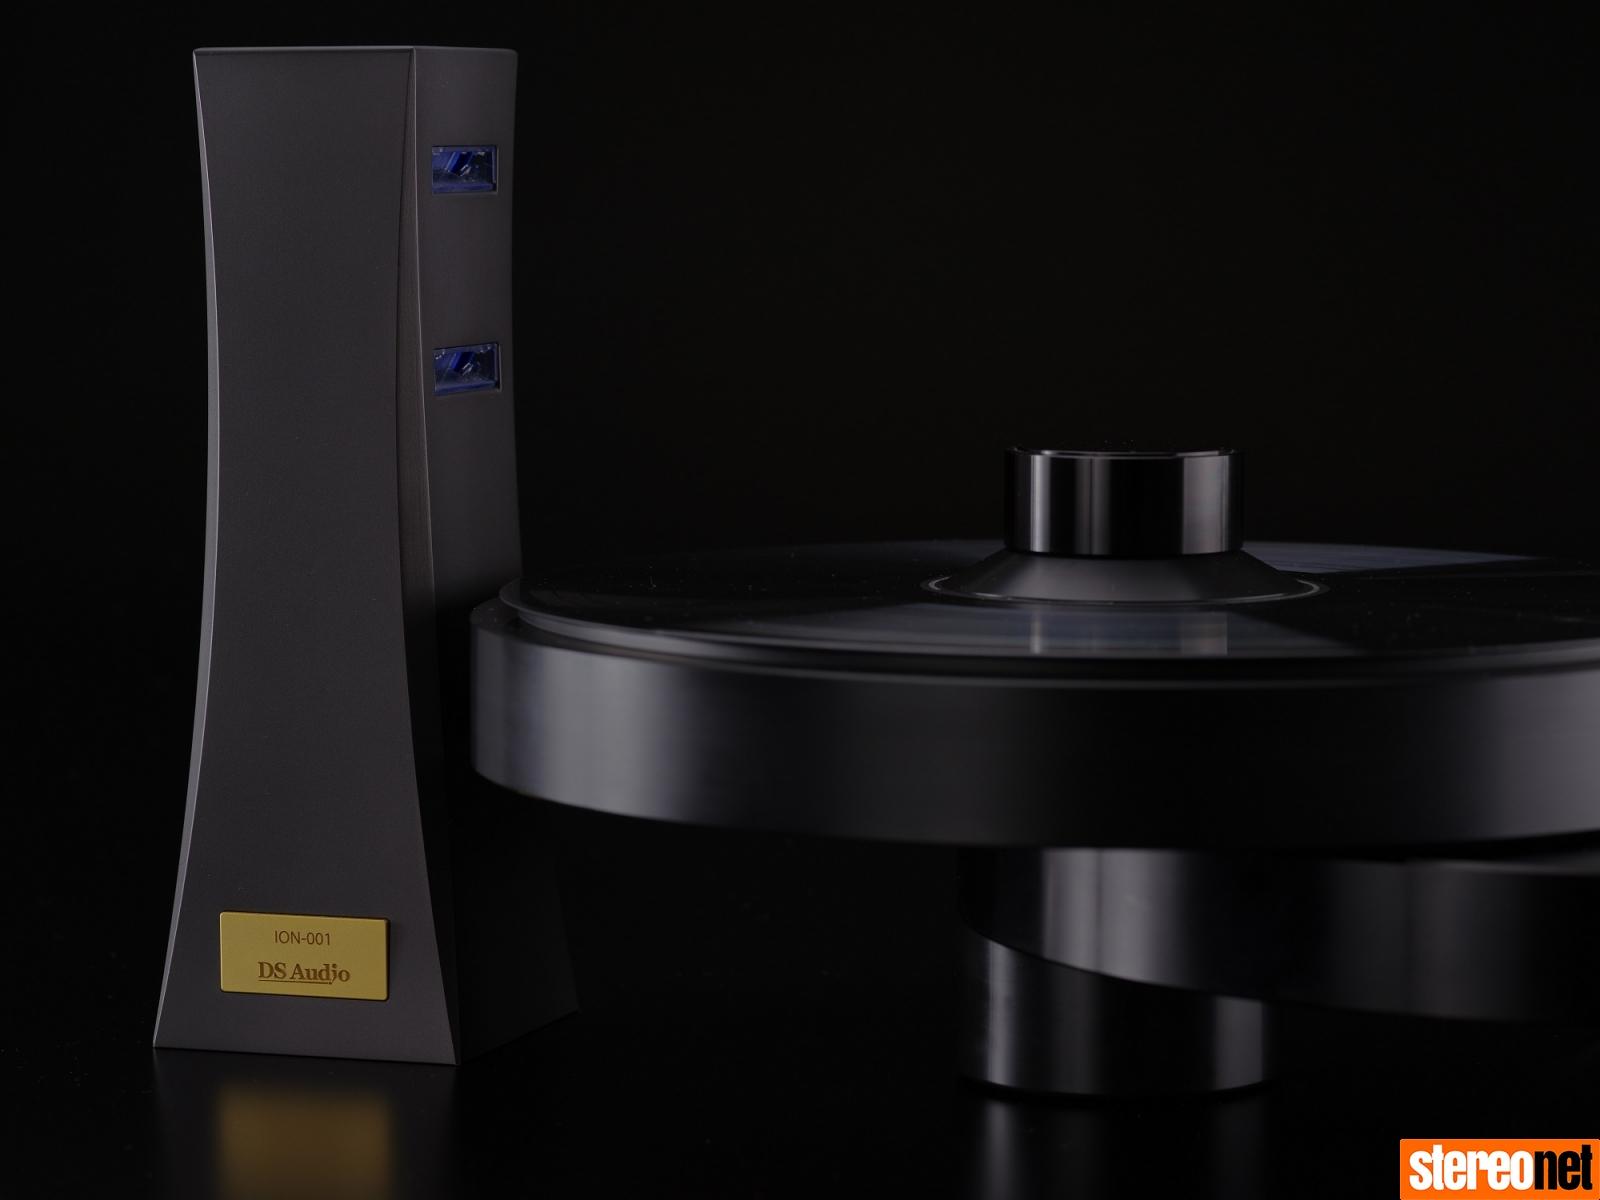 DS Audio ION-001